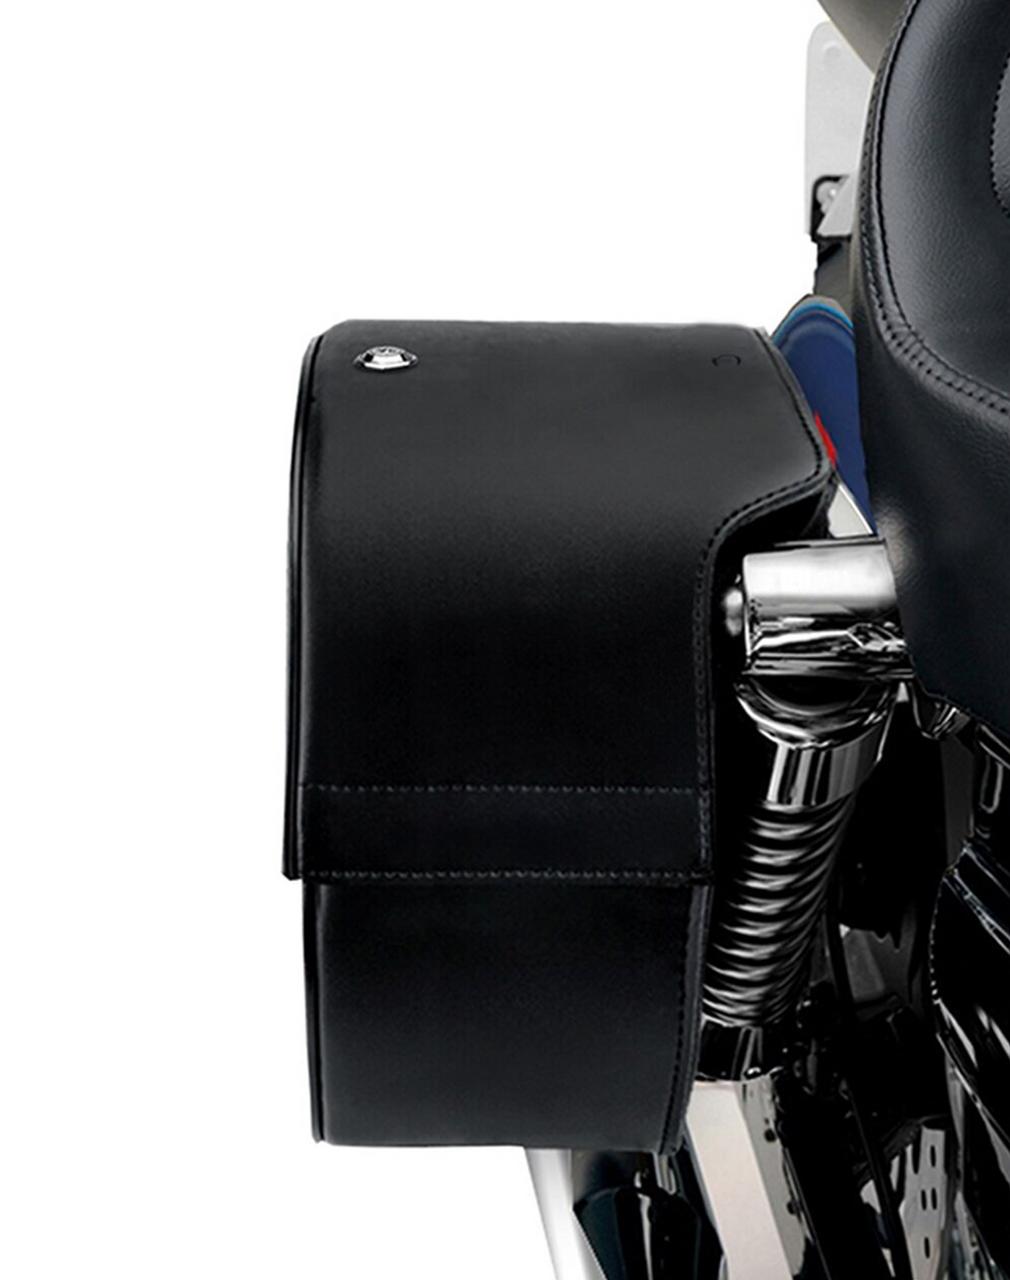 Triumph Thunderbird Shock Cutout Slanted Studded Large Motorcycle Saddlebags Shock Cutout View